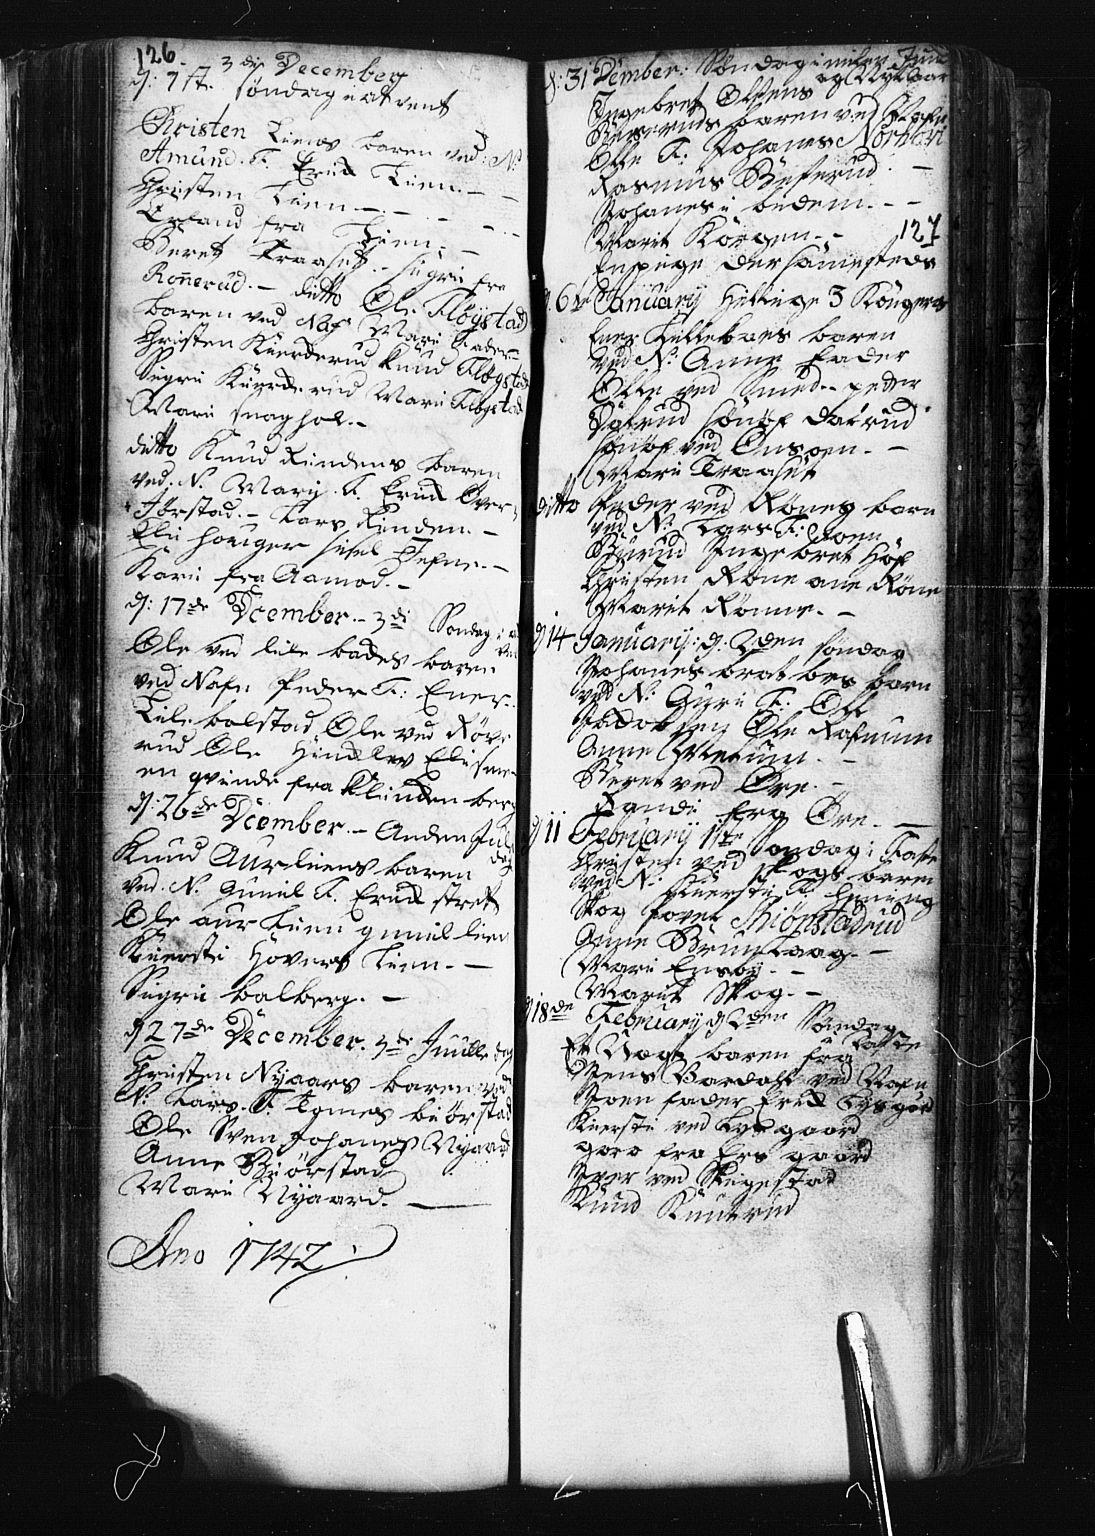 SAH, Fåberg prestekontor, Klokkerbok nr. 1, 1727-1767, s. 126-127